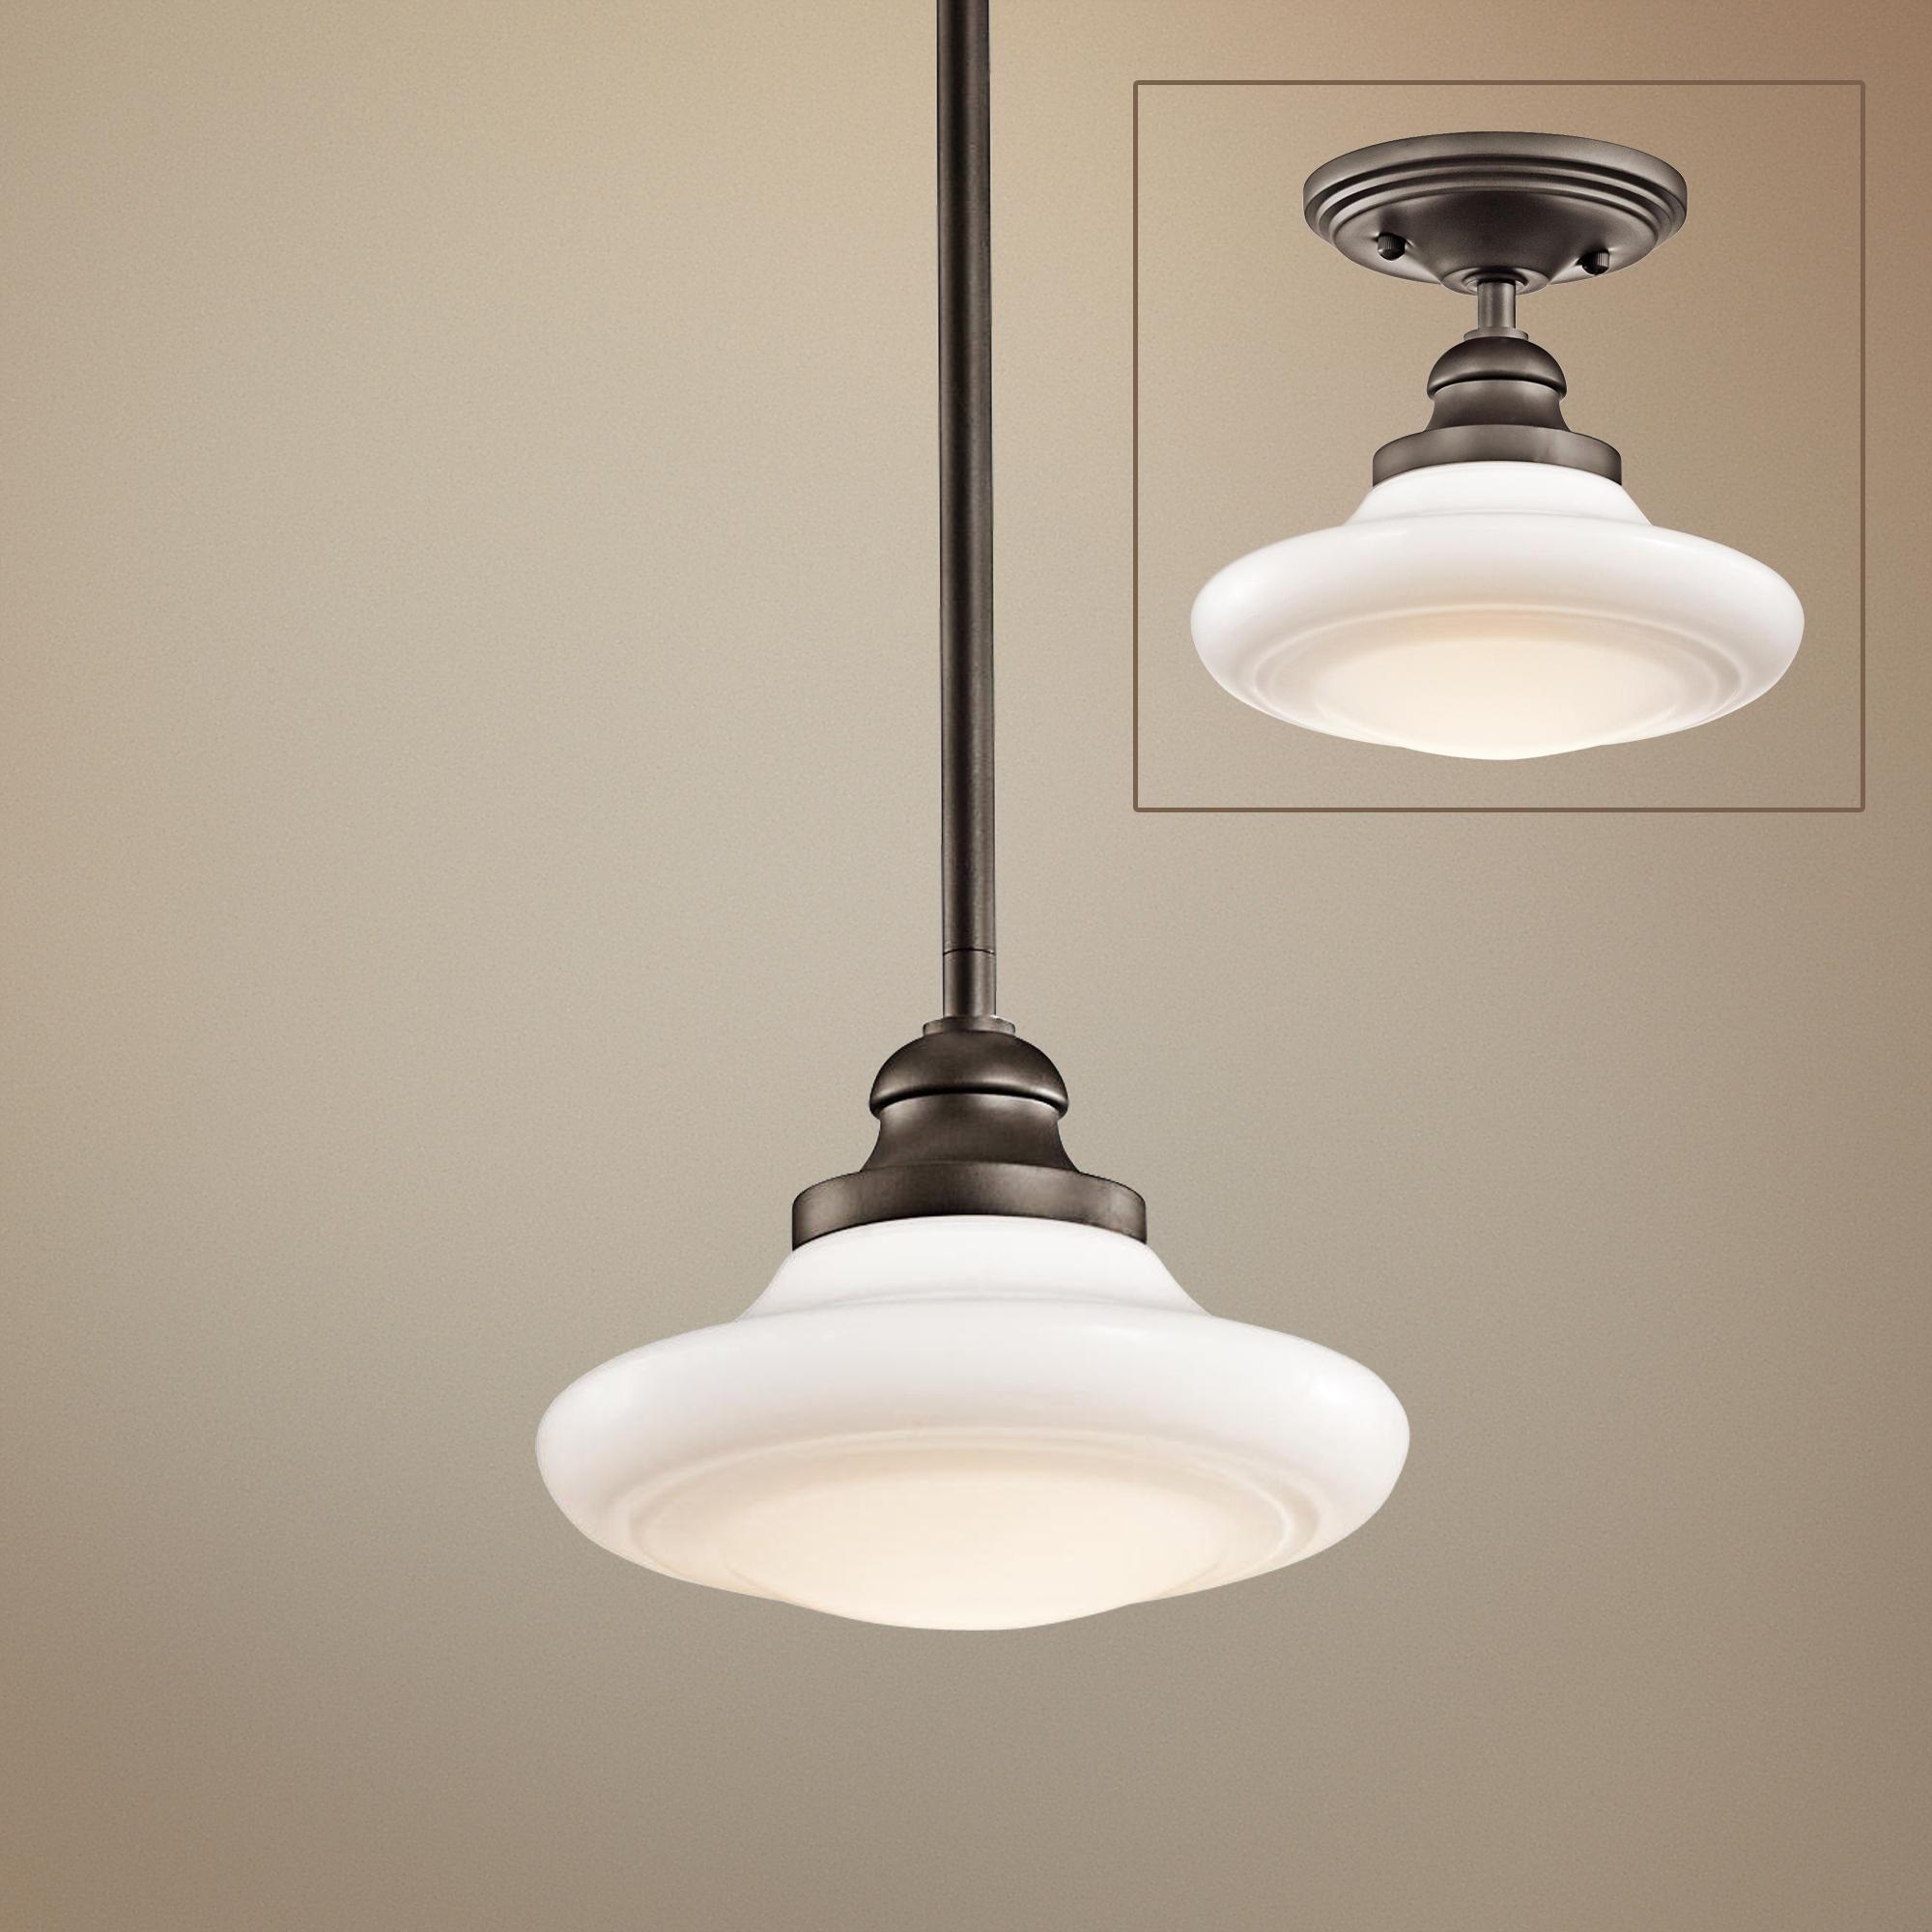 "Kichler Keller 8"" Wide Olde Bronze Pendant Light"